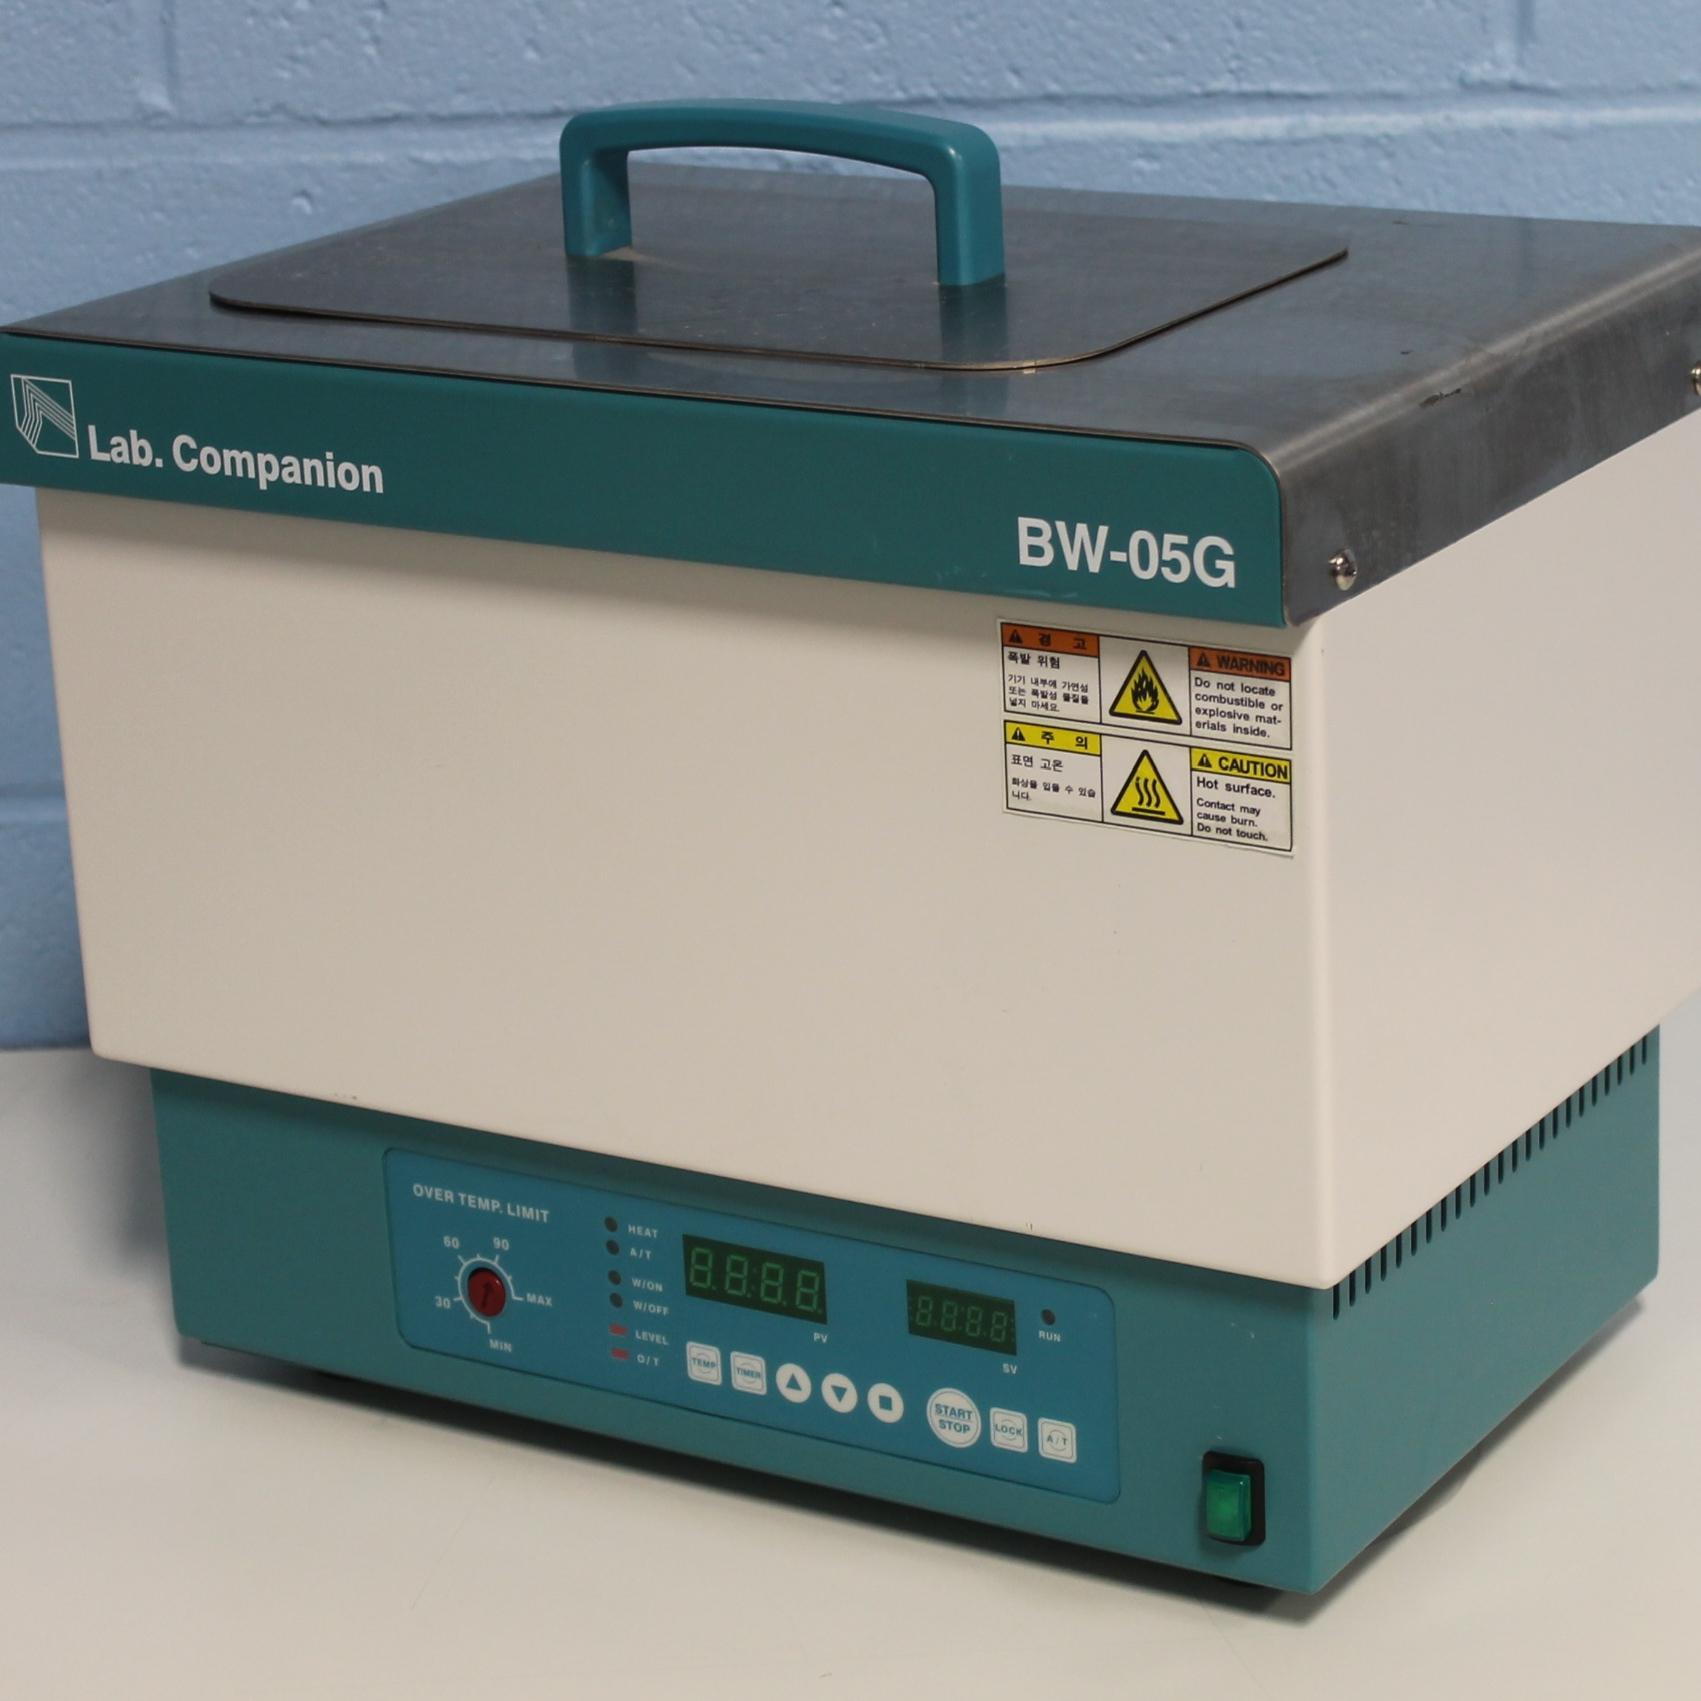 Lab Companion BW-05G 5 liter Heating Bath Image